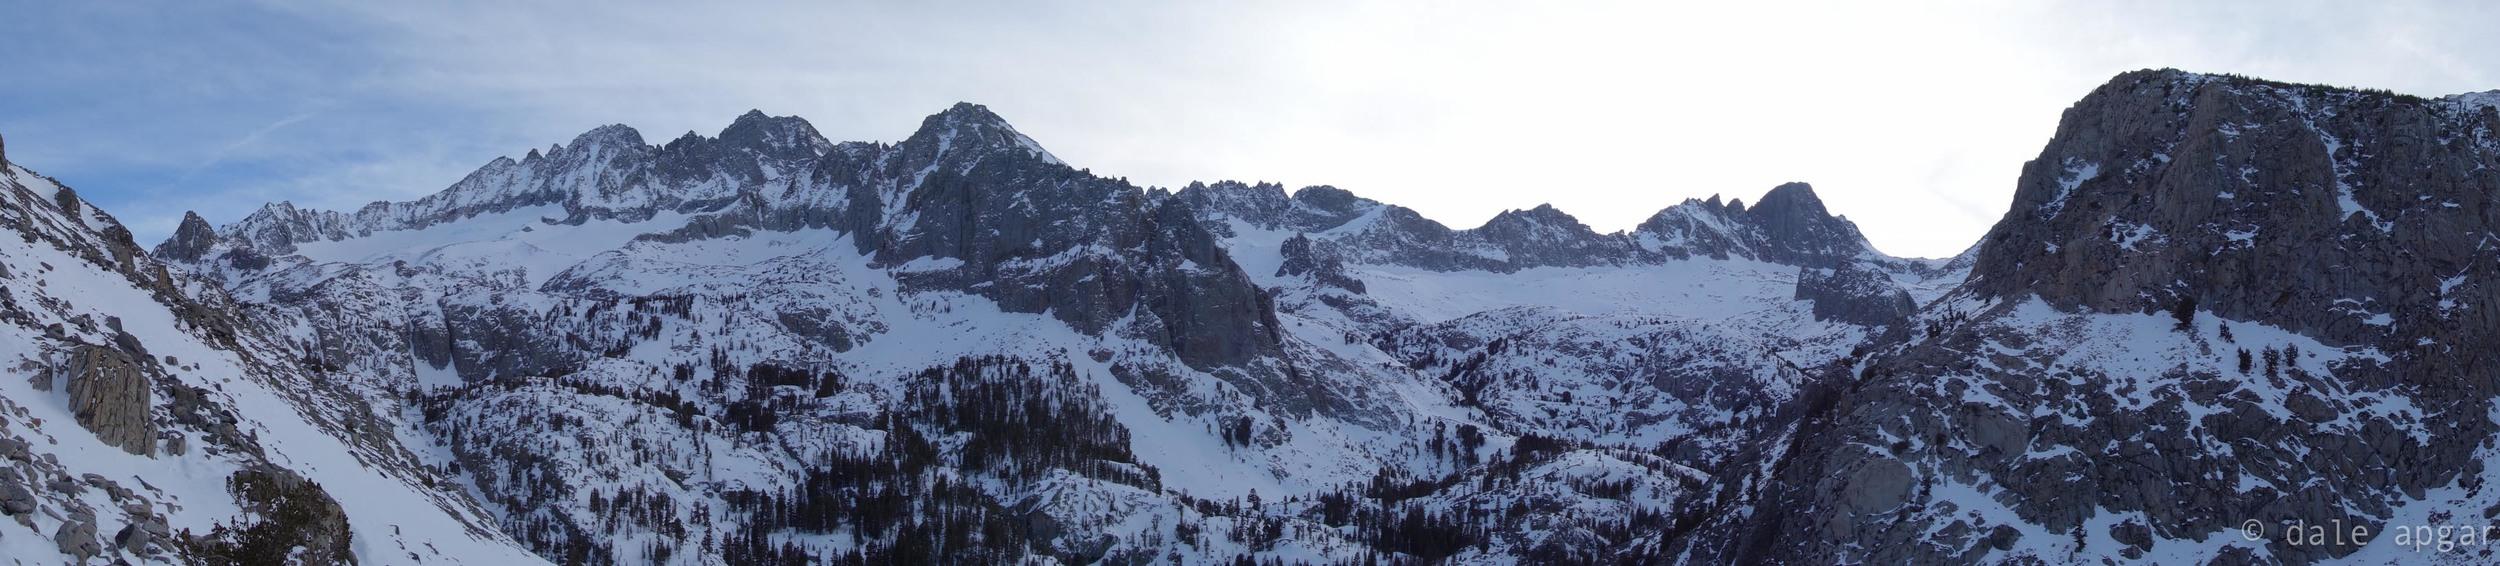 mountain_hangover_one-3.jpg